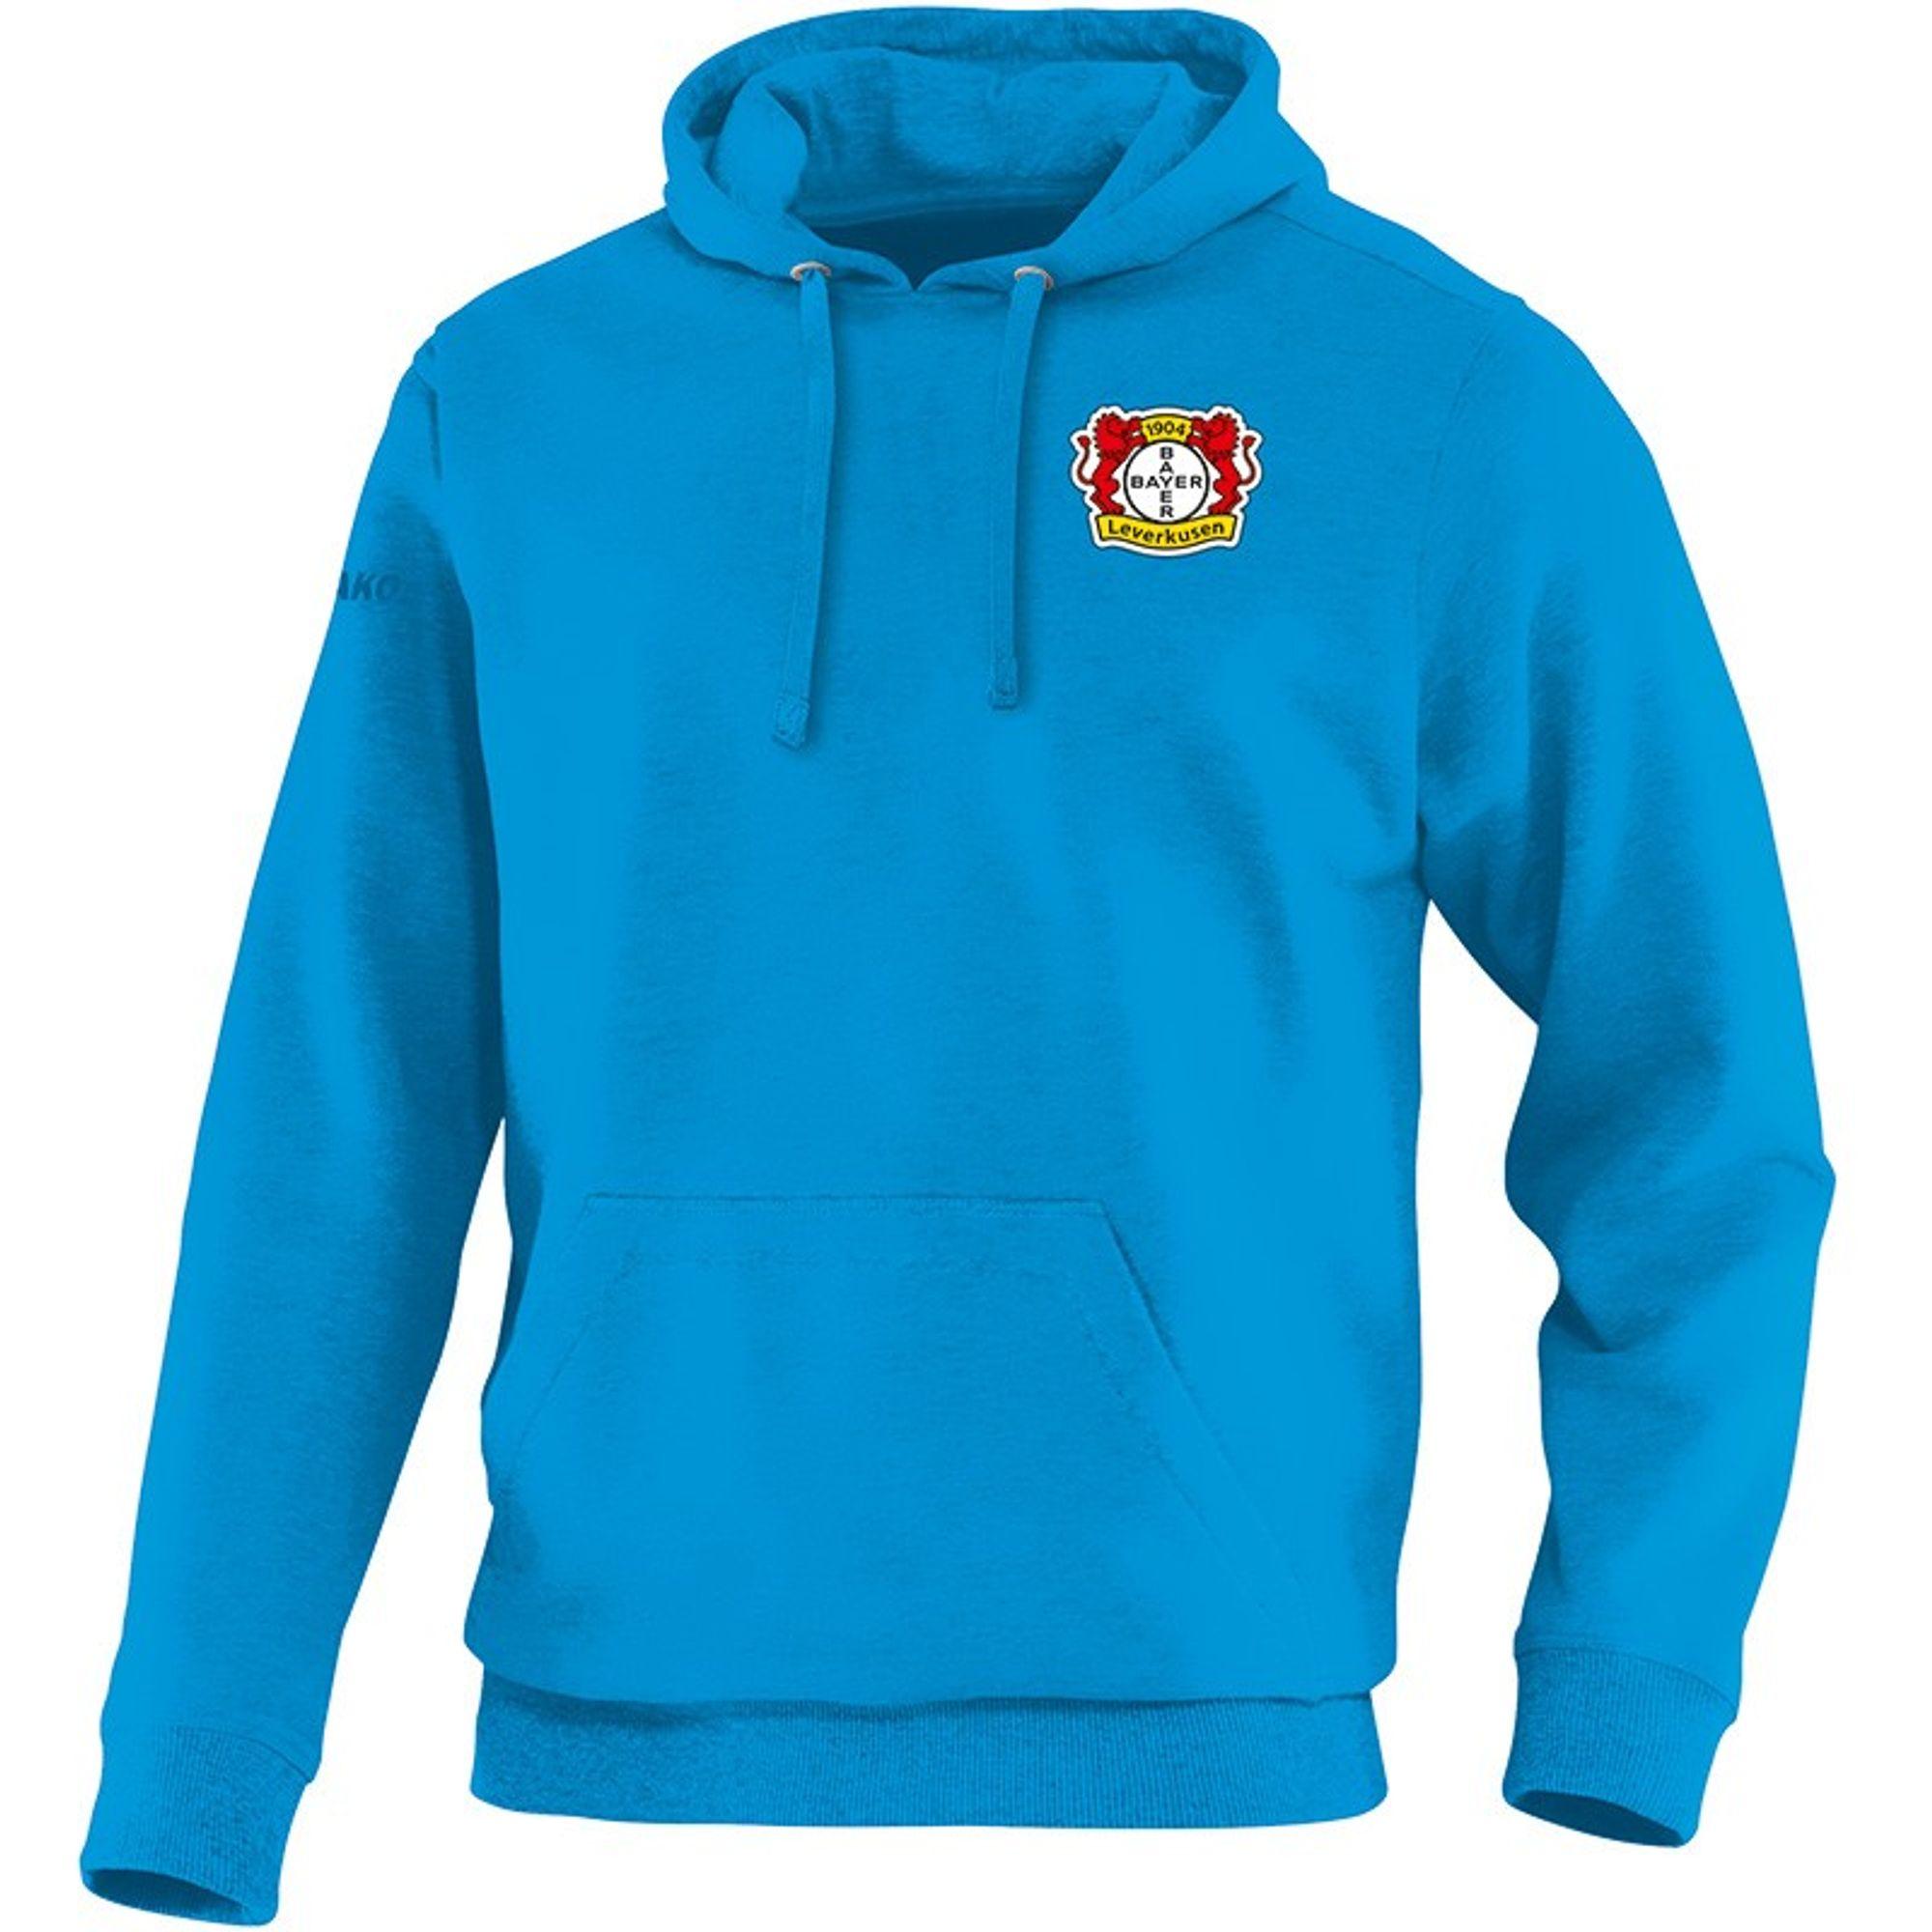 Jako Bayer 04 Leverkusen Kapuzensweat Team - blau